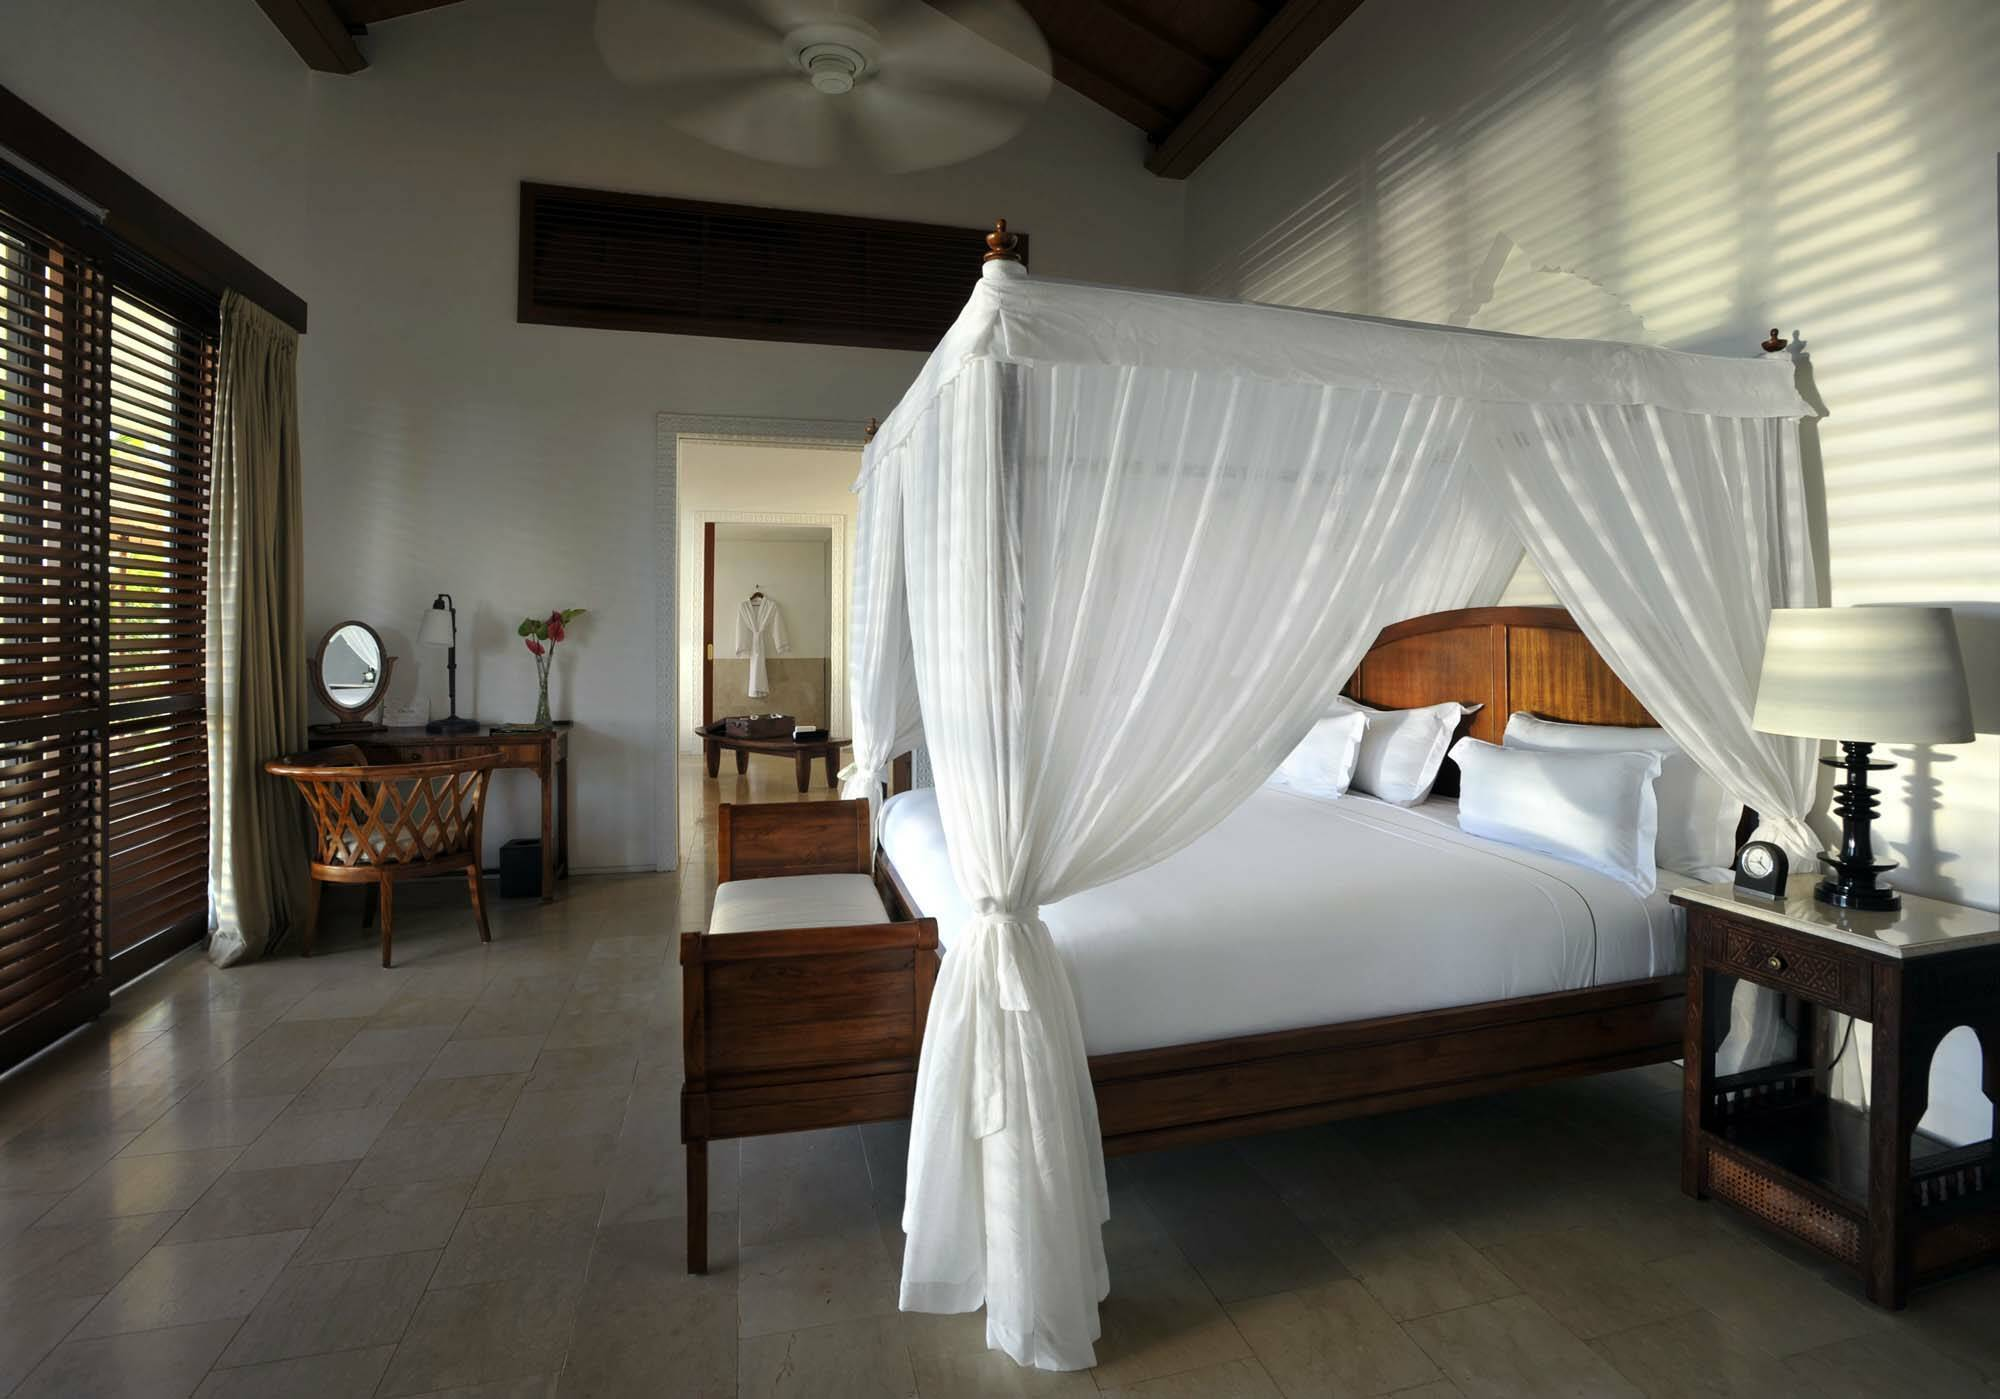 The Residence Suite Presidentielle Chambre Zanzibar